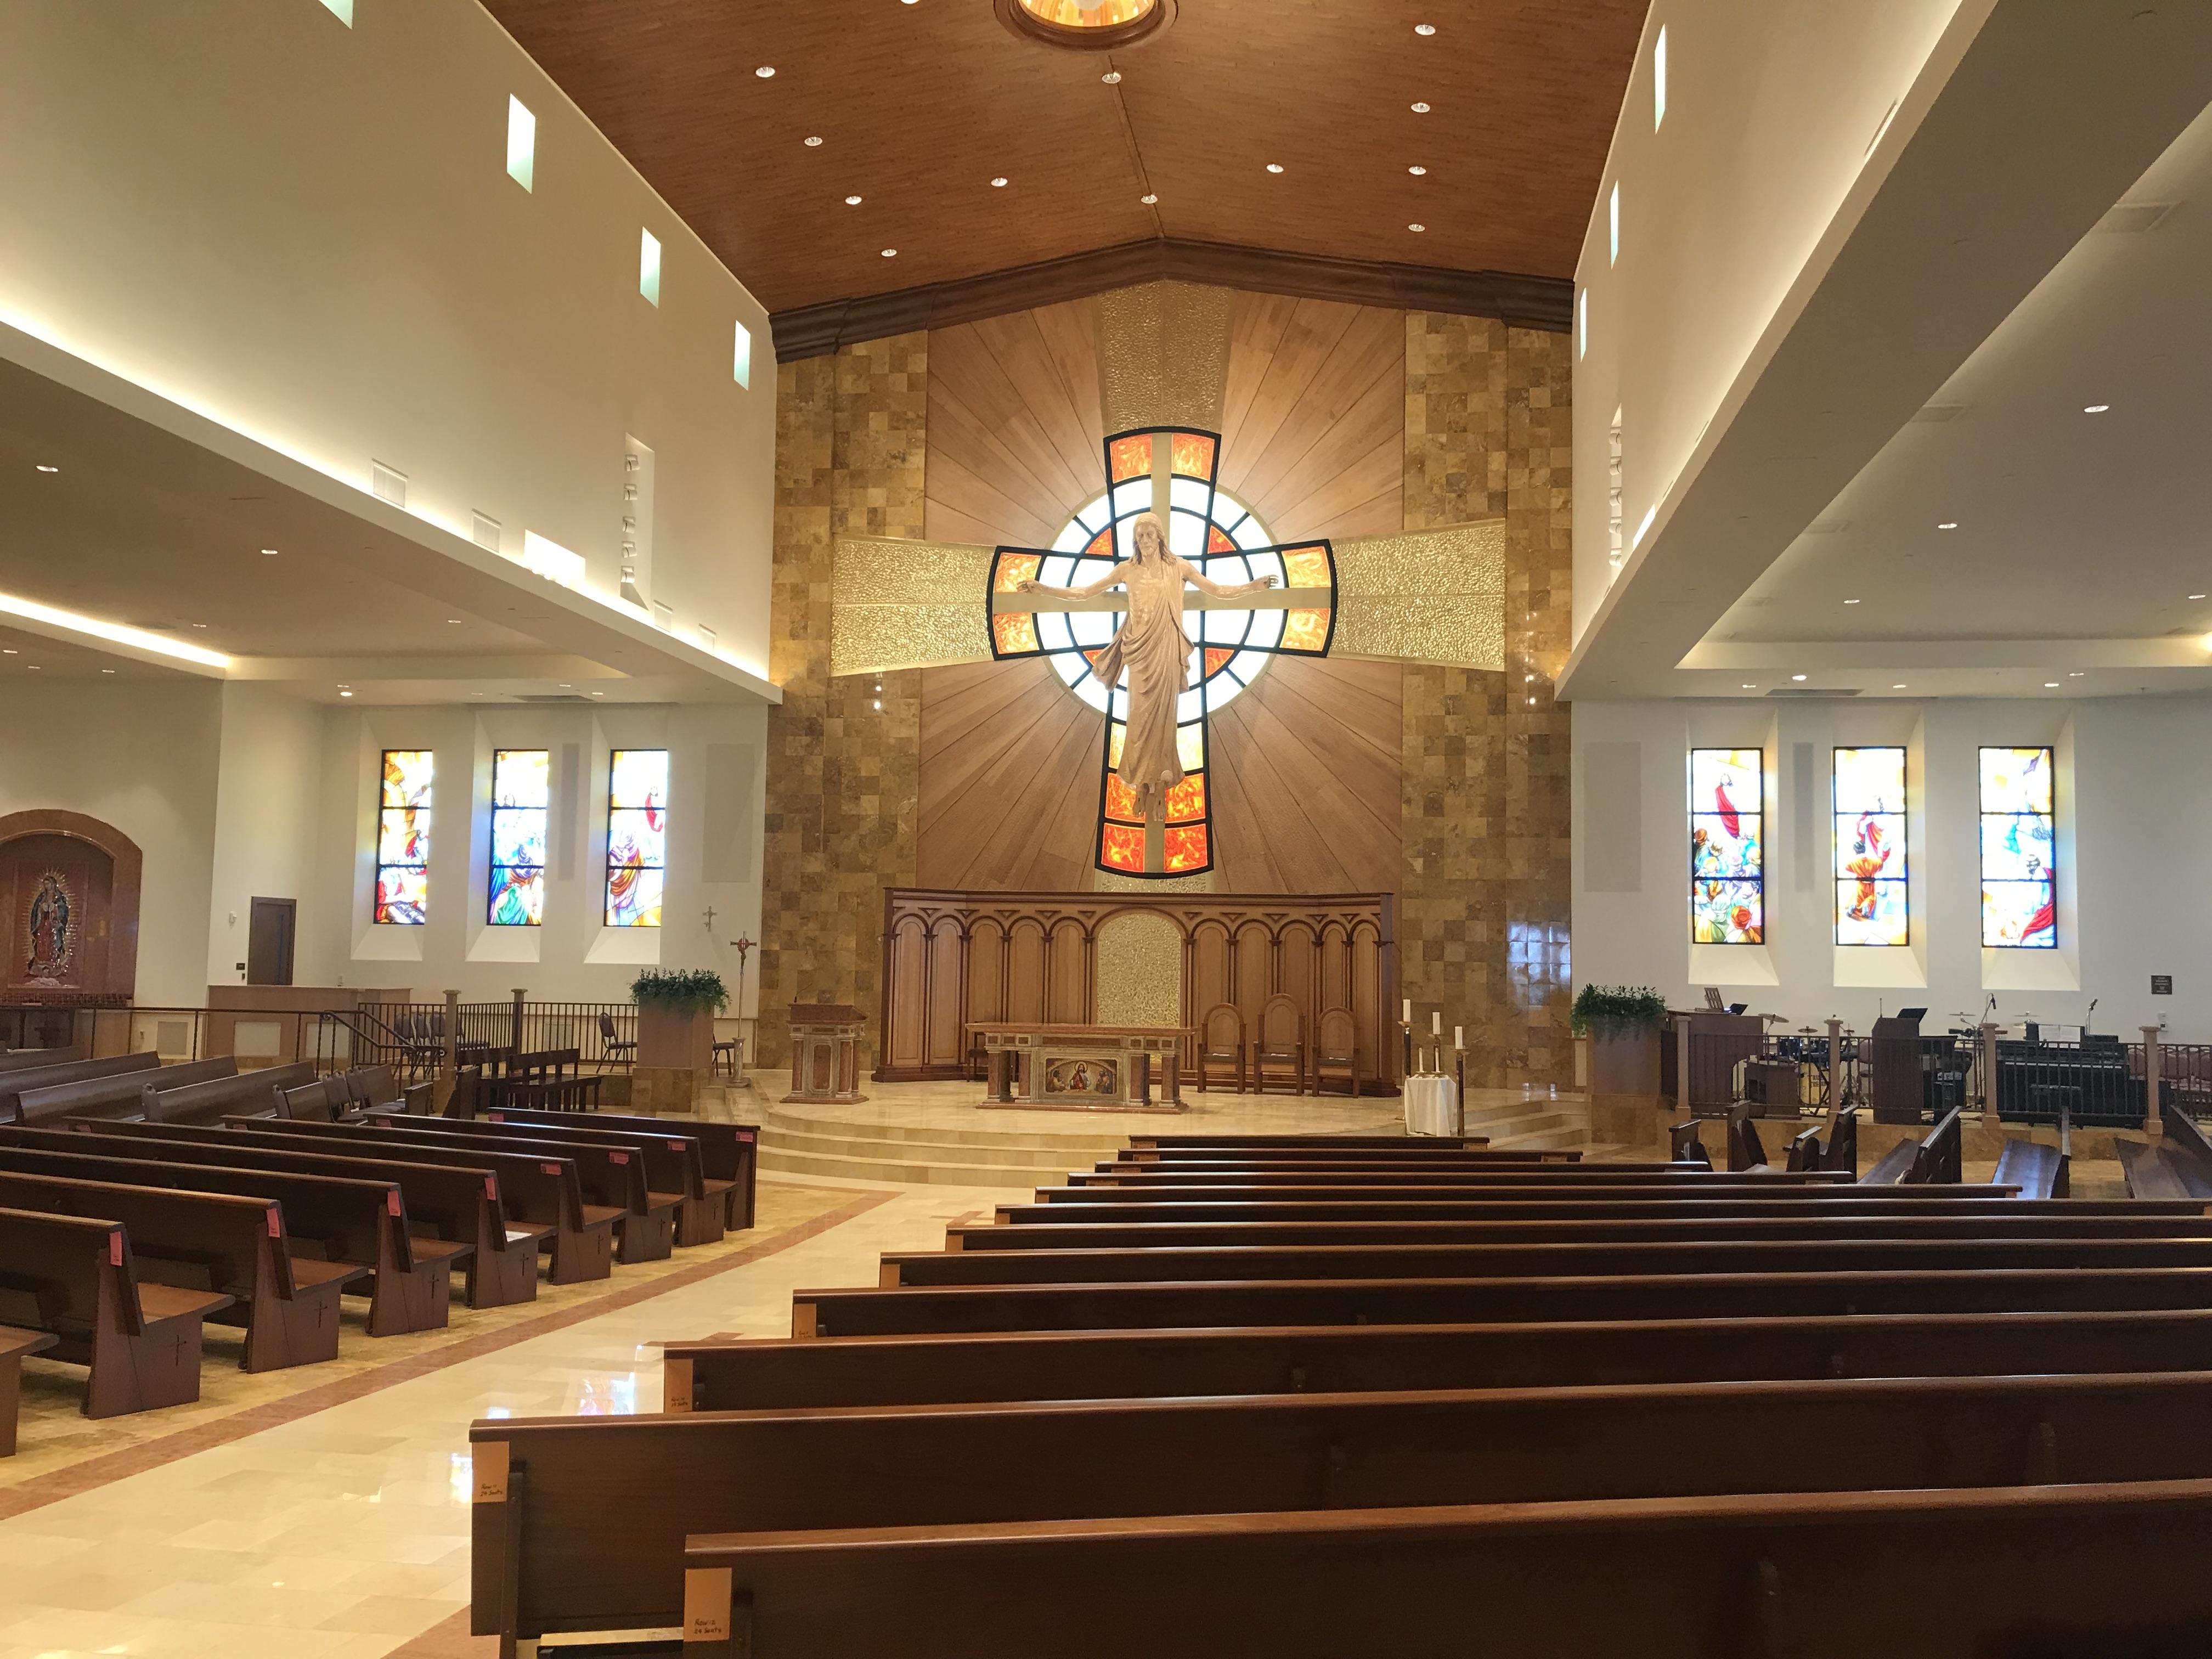 Nave Facing Altar